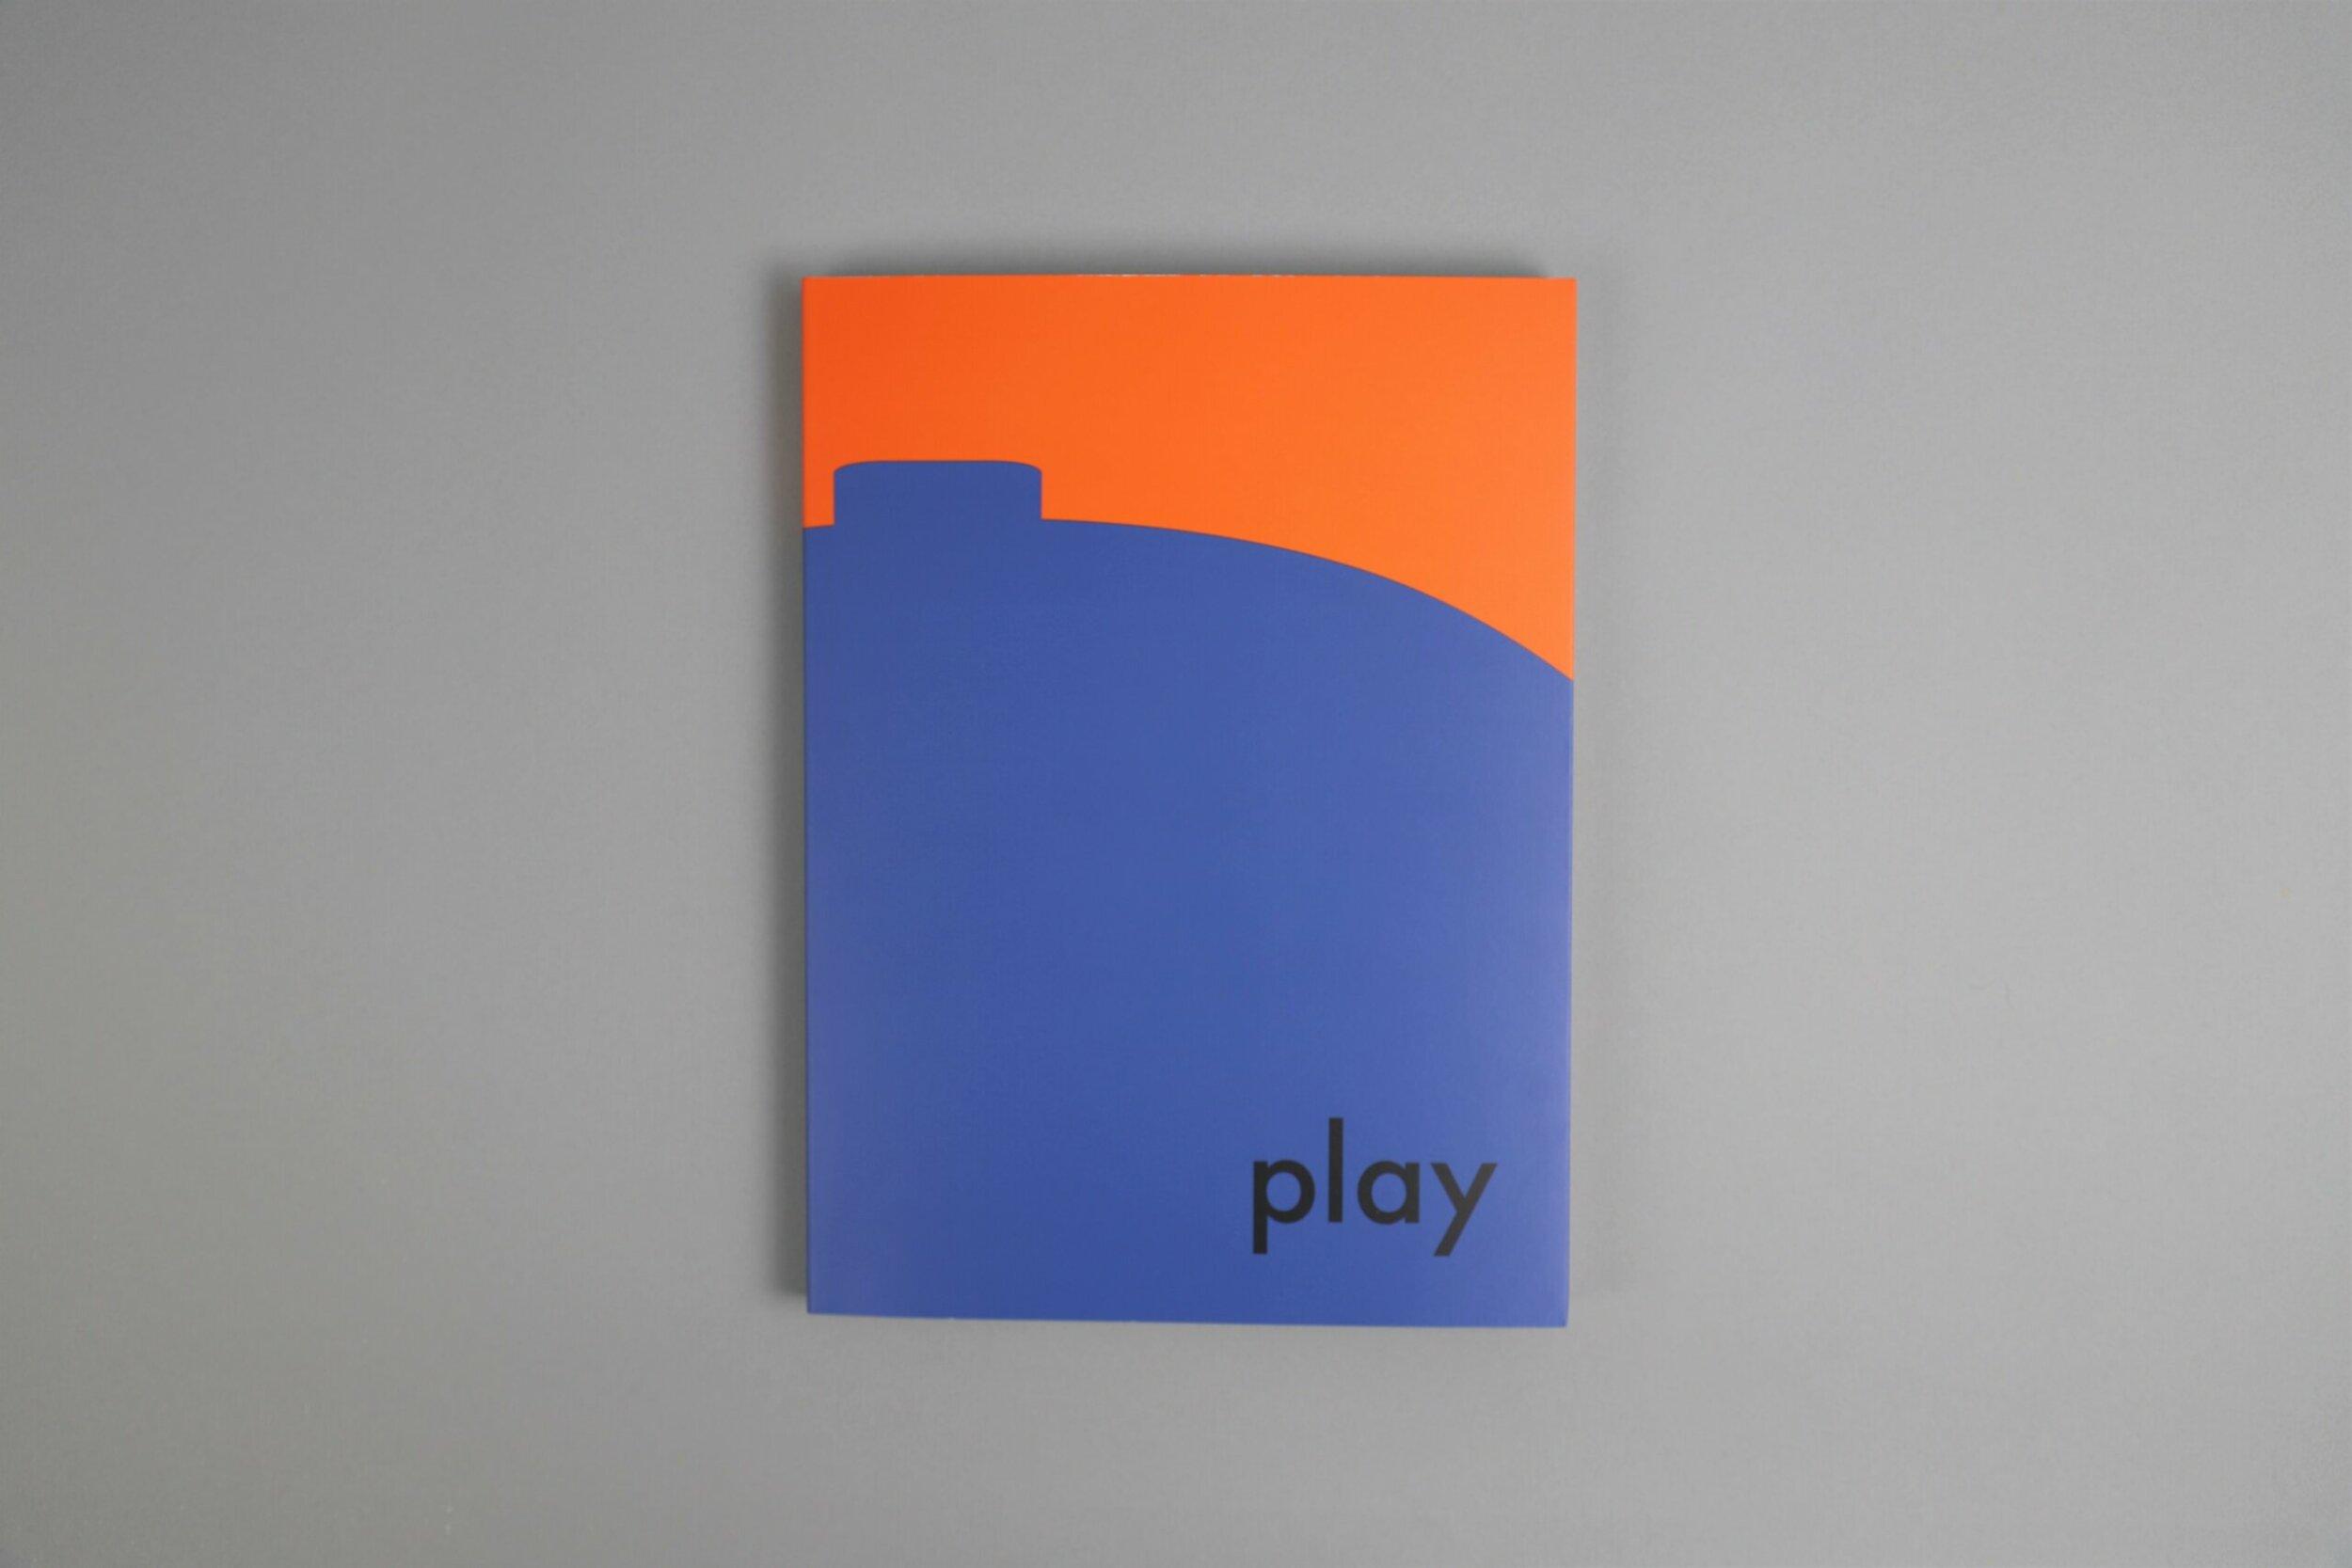 play-evaveldhoen-self